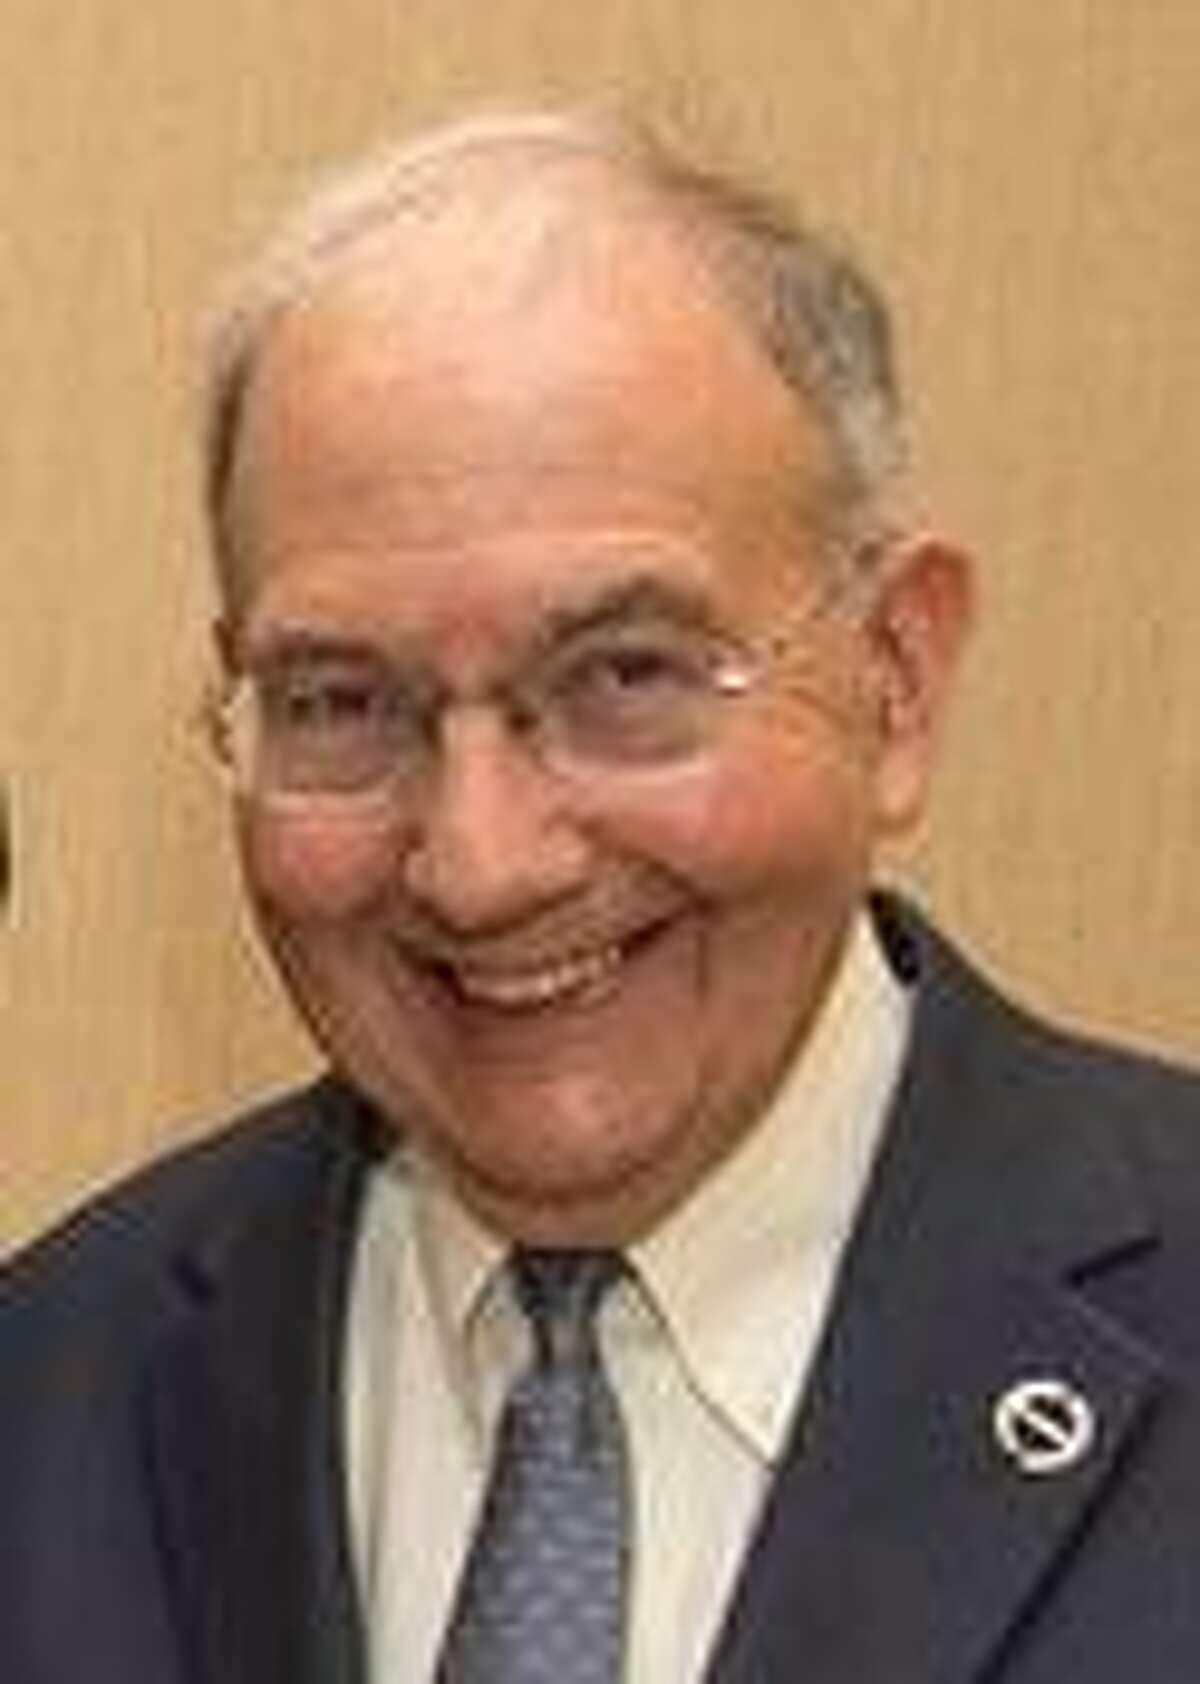 Senate President Pro Tempore Martin M. Looney, D-New Haven